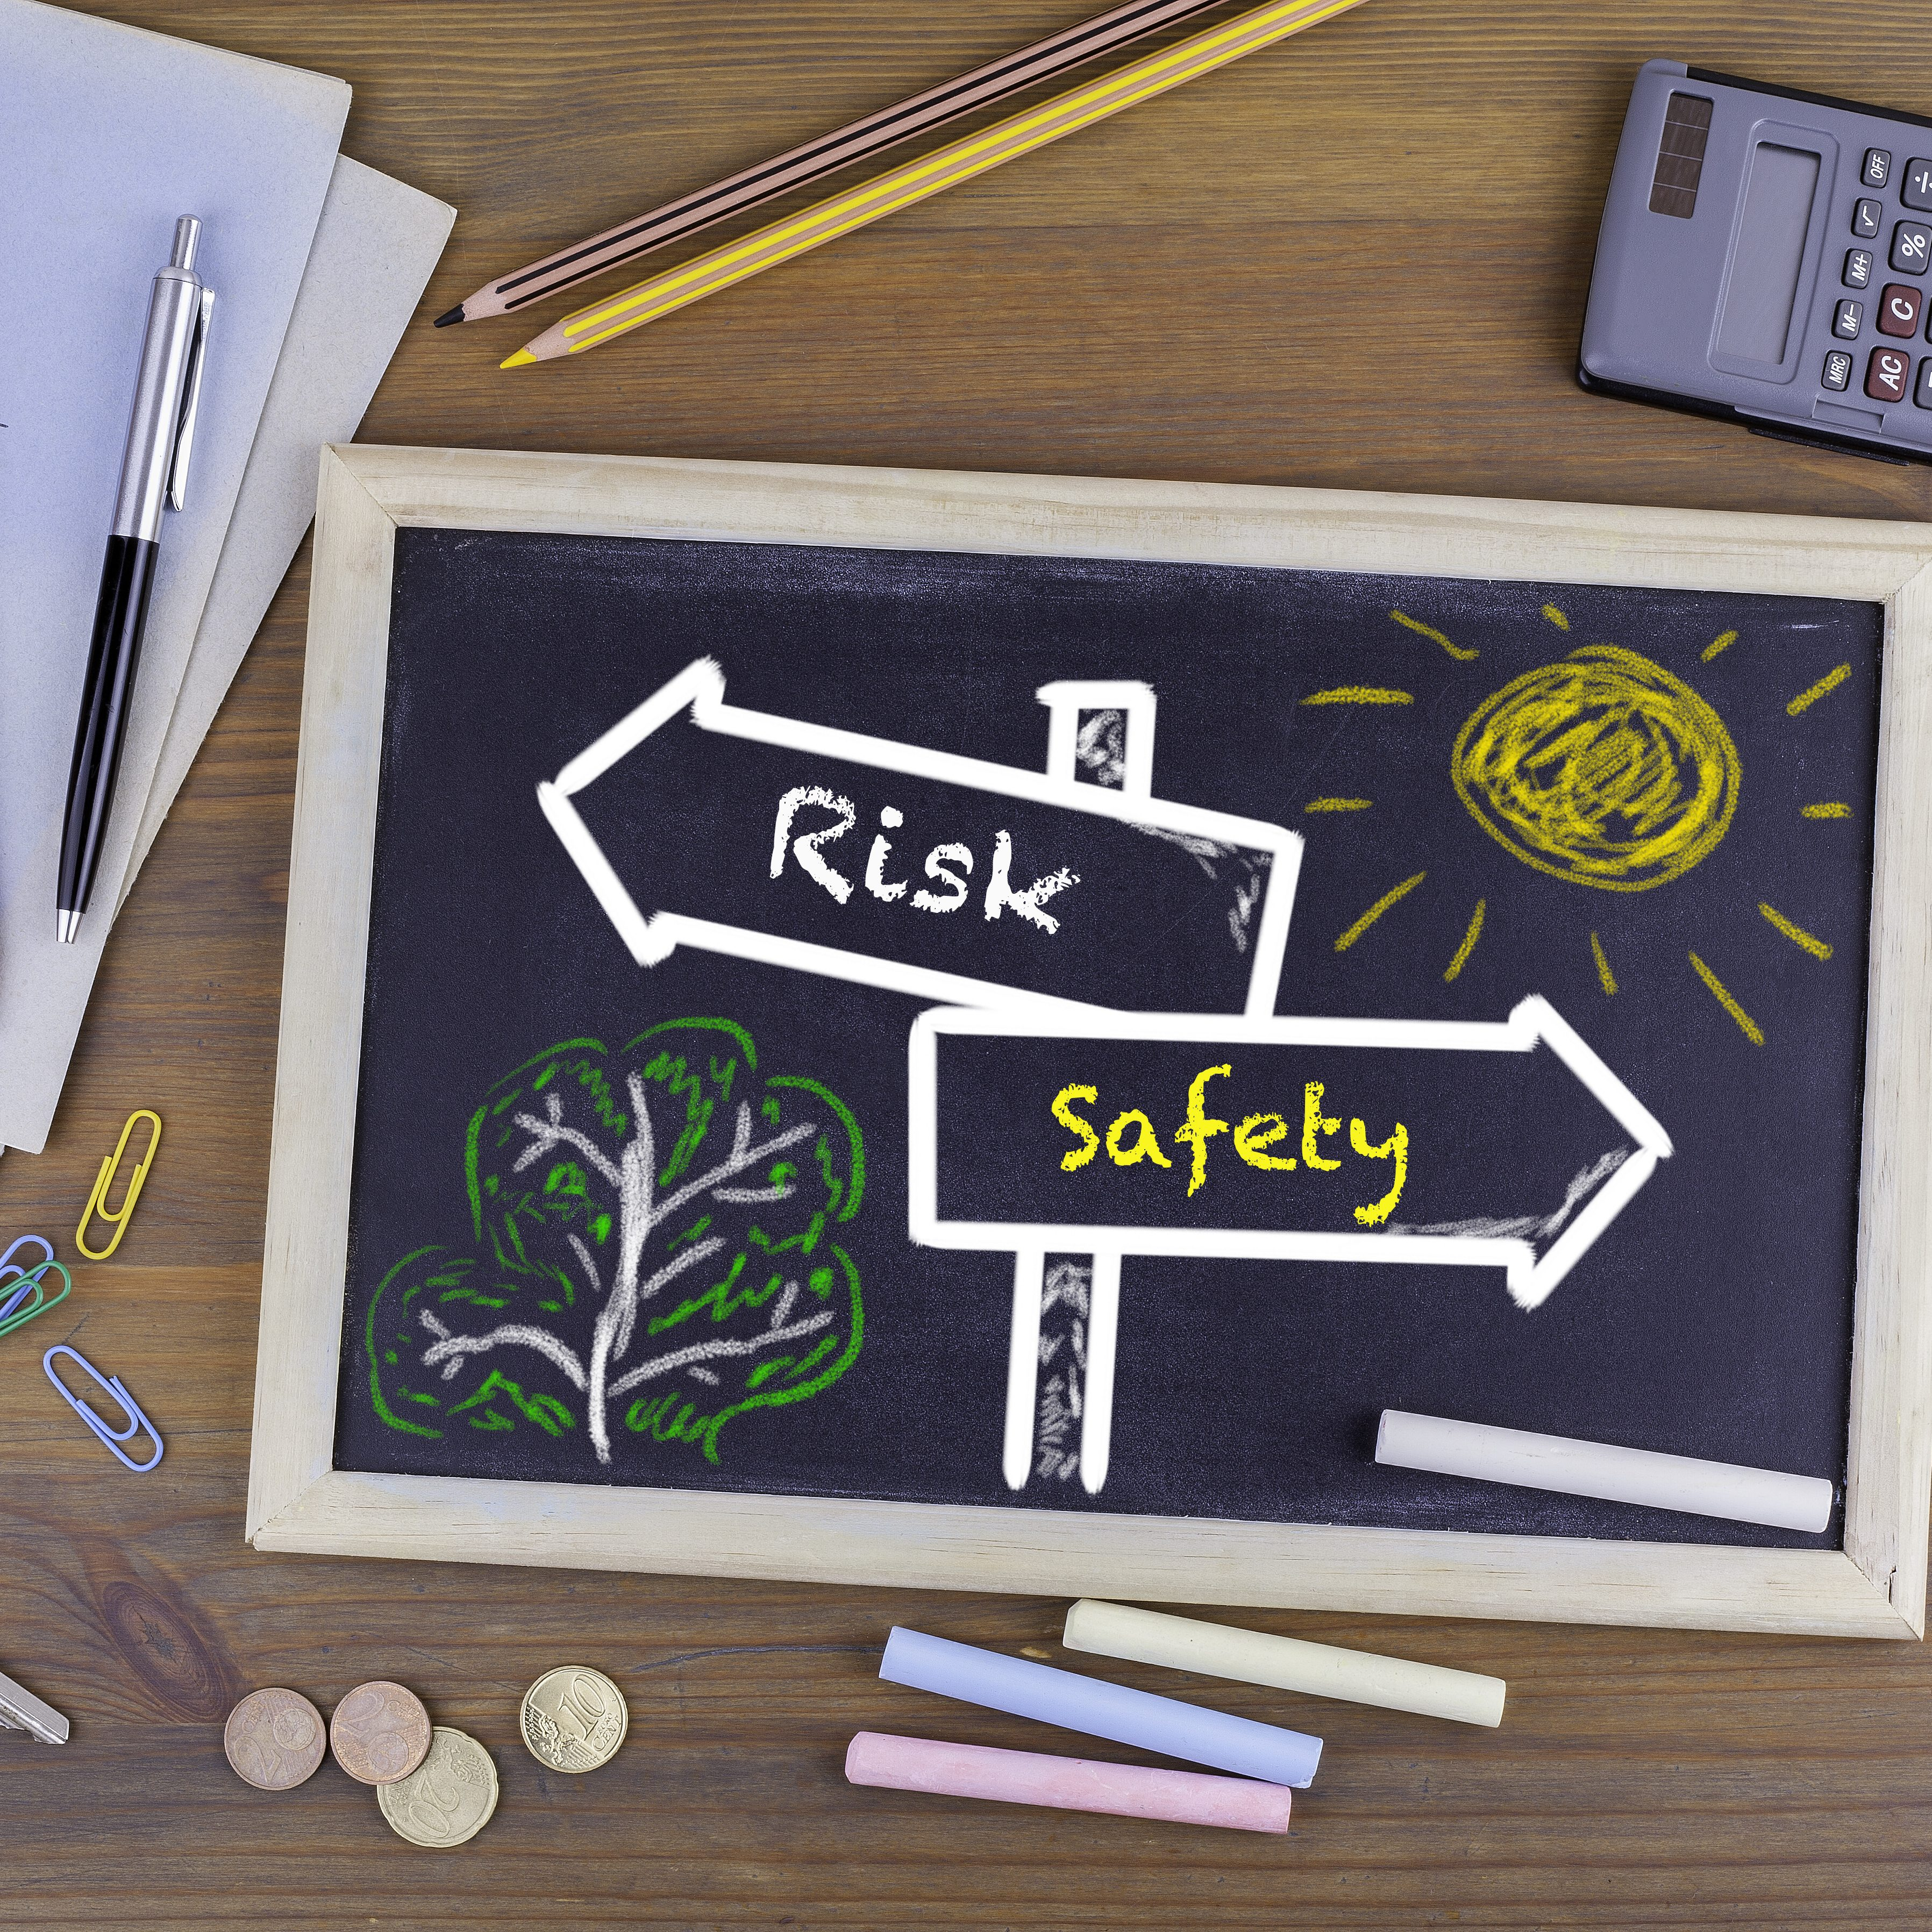 Risk, Safety signpost drawn on a blackboard